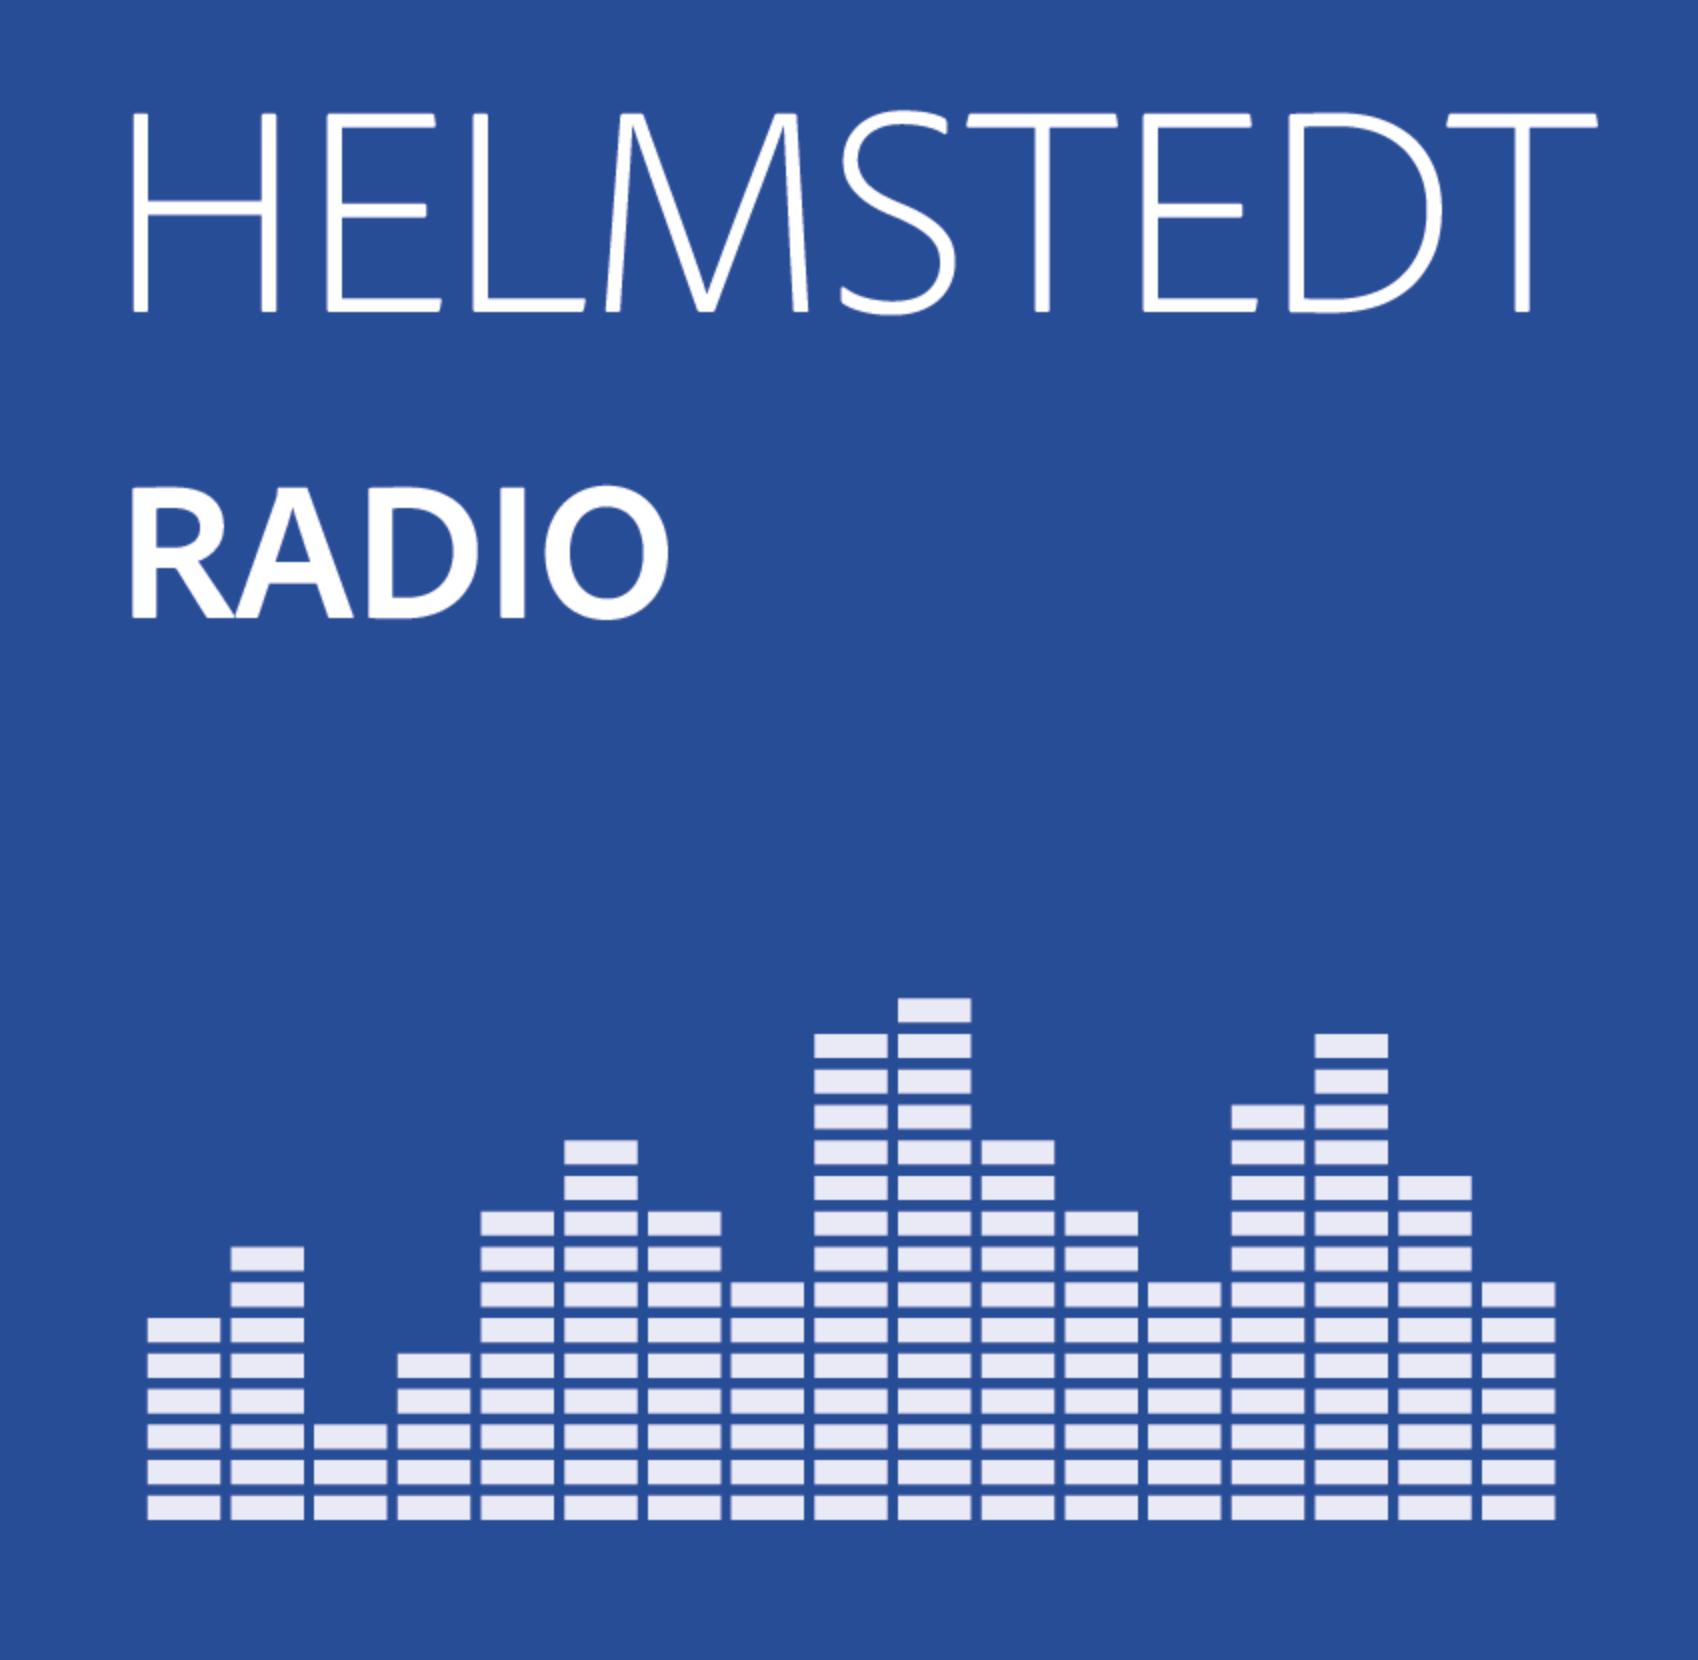 Helmstedt-Radio